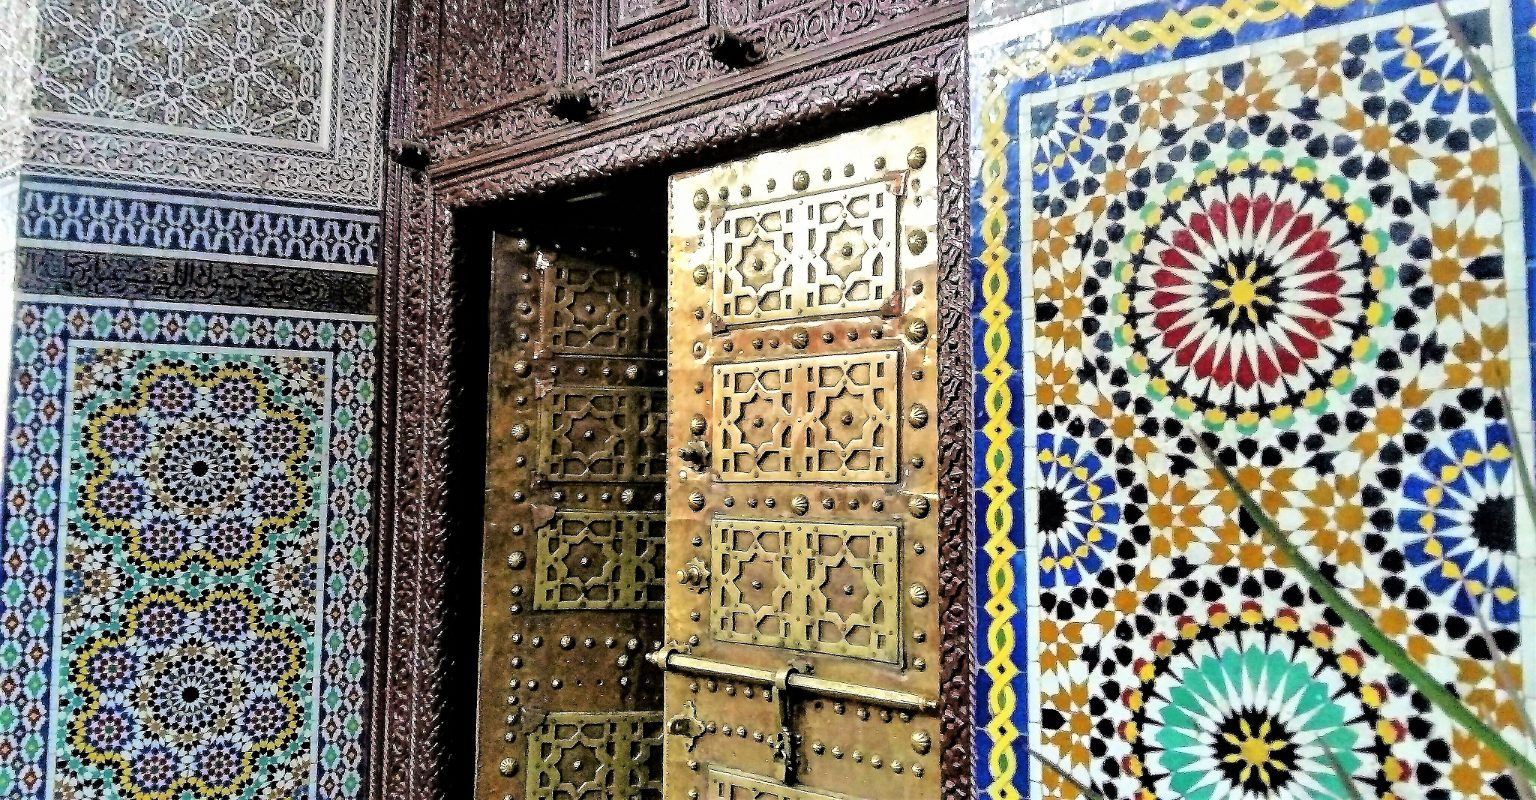 histoire de l'artisanat marocain